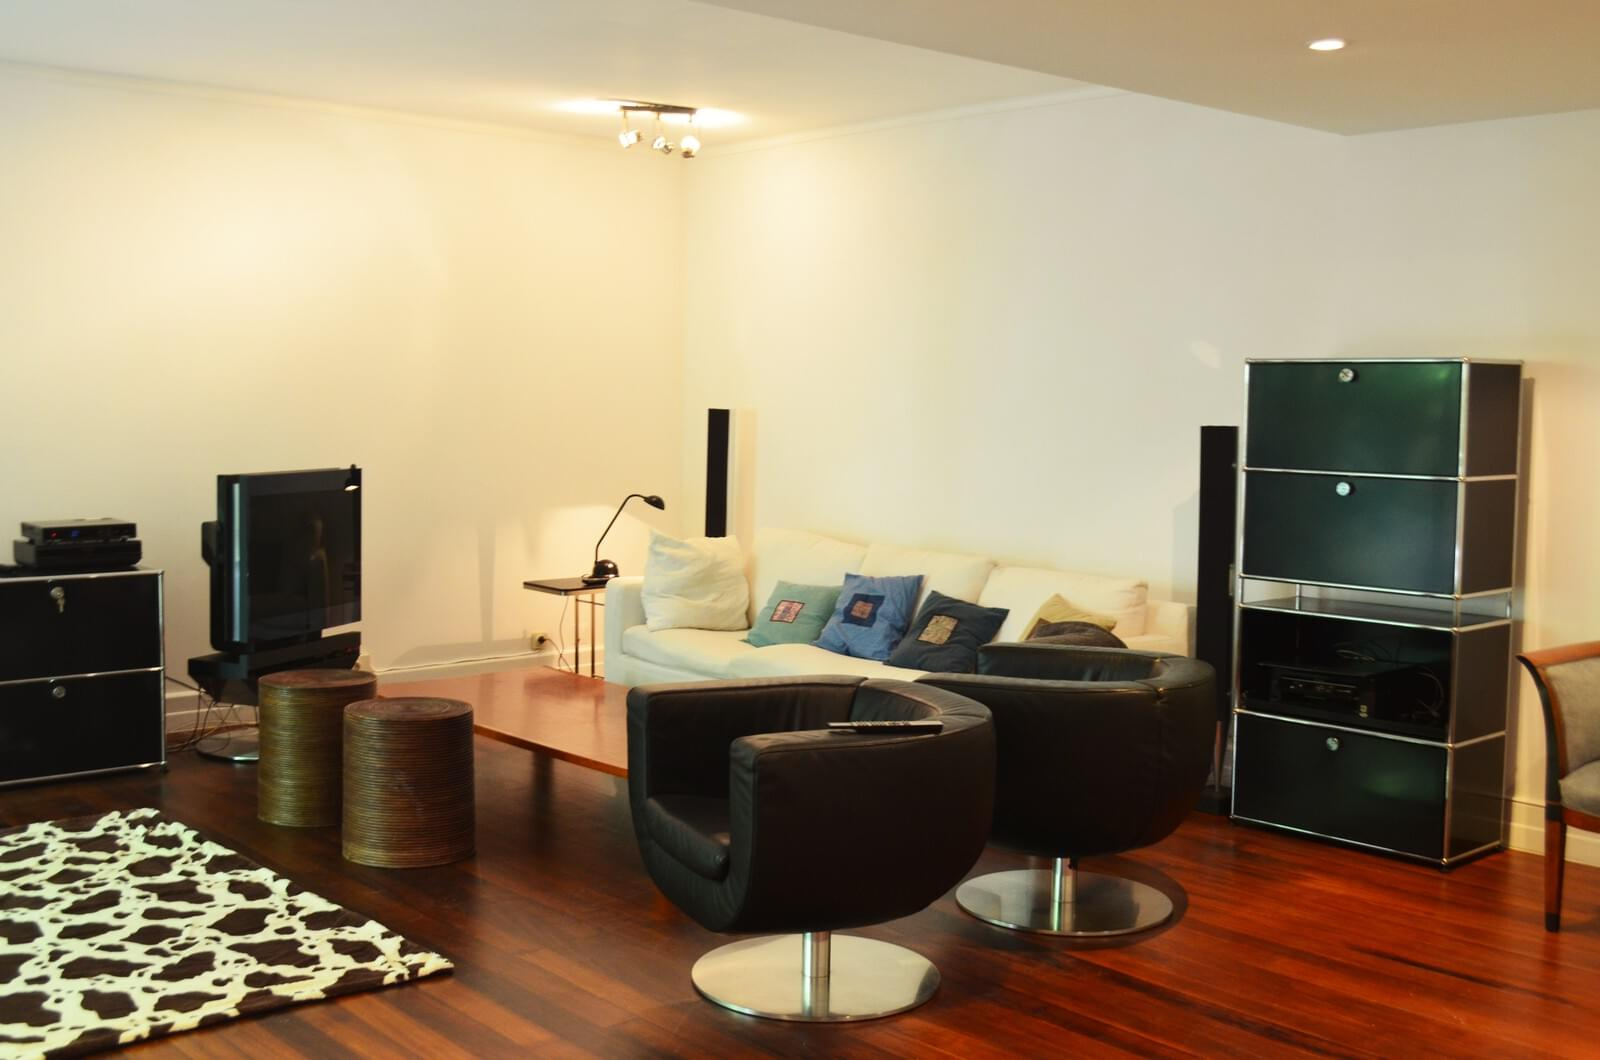 pf17565-apartamento-t3-lisboa-cf09c33e-efe0-472b-8f58-d25f470b8e39